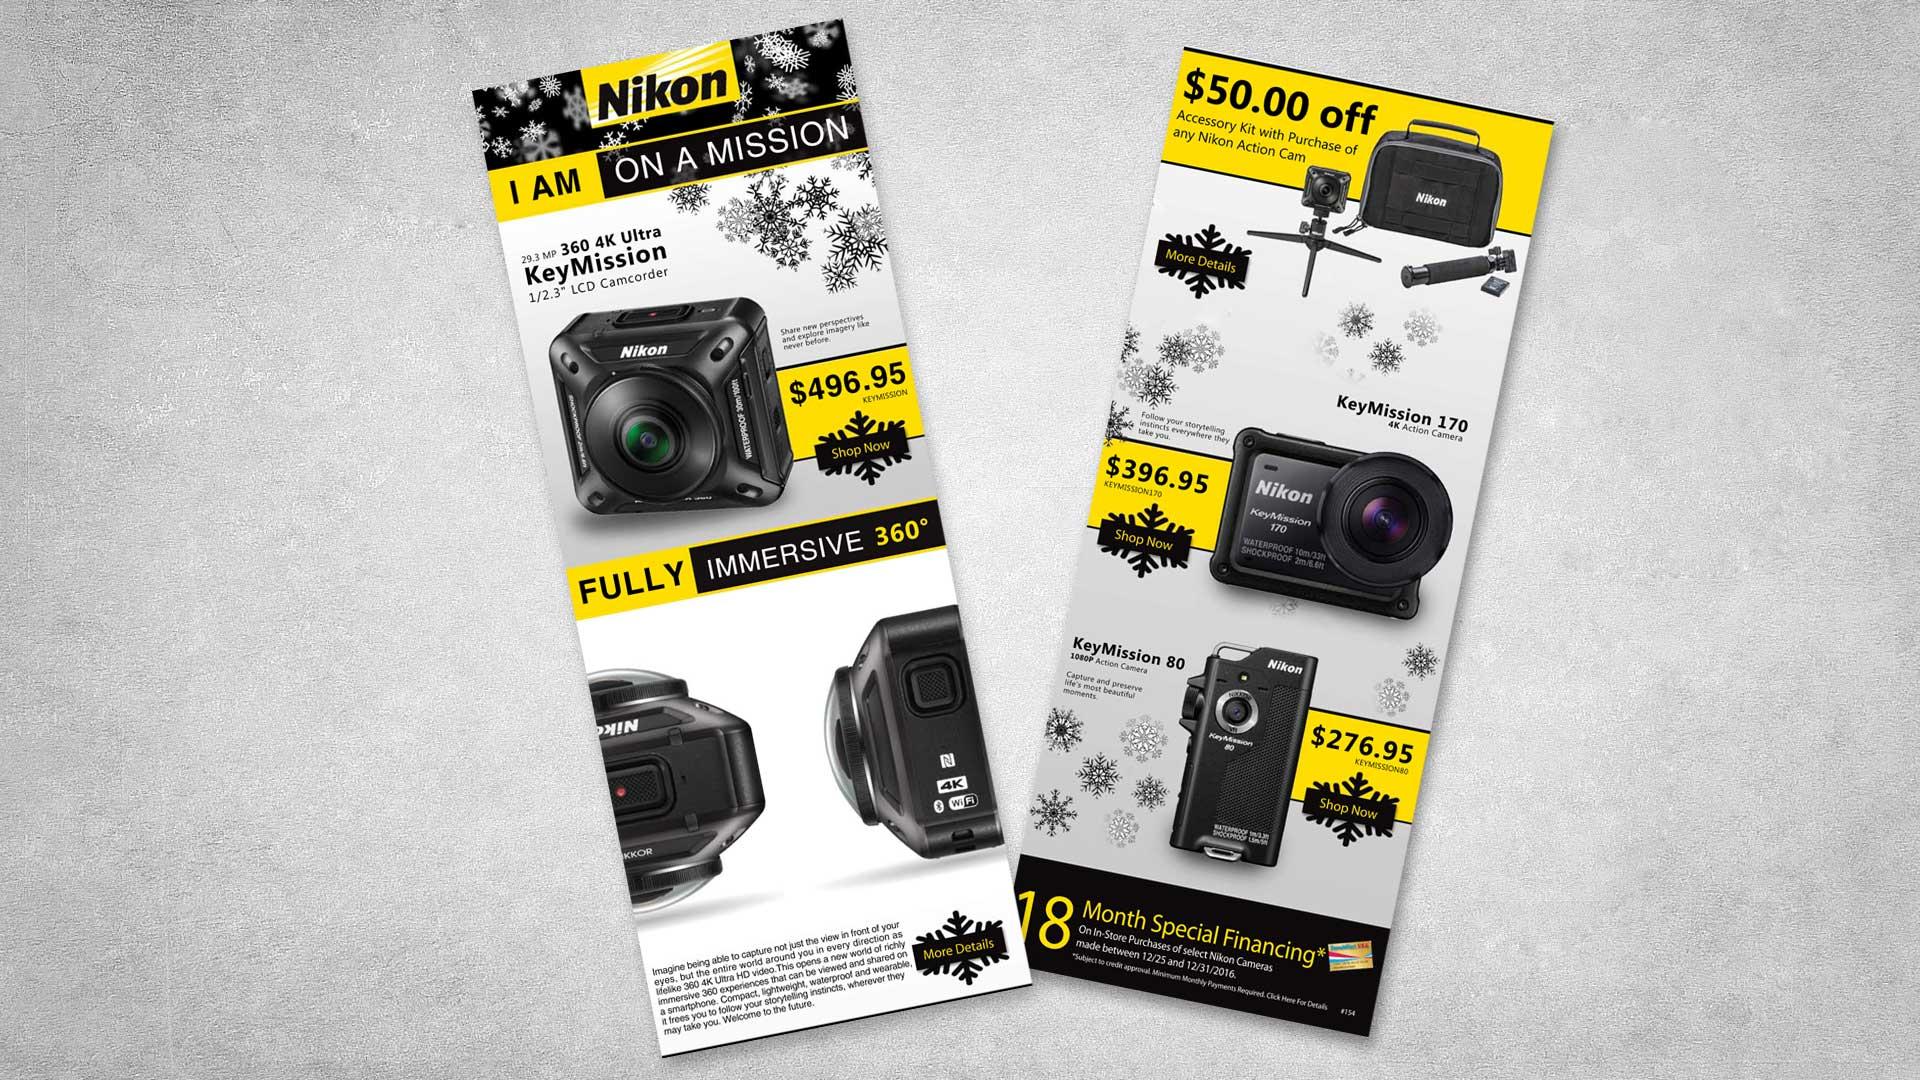 Nikon Email Blast